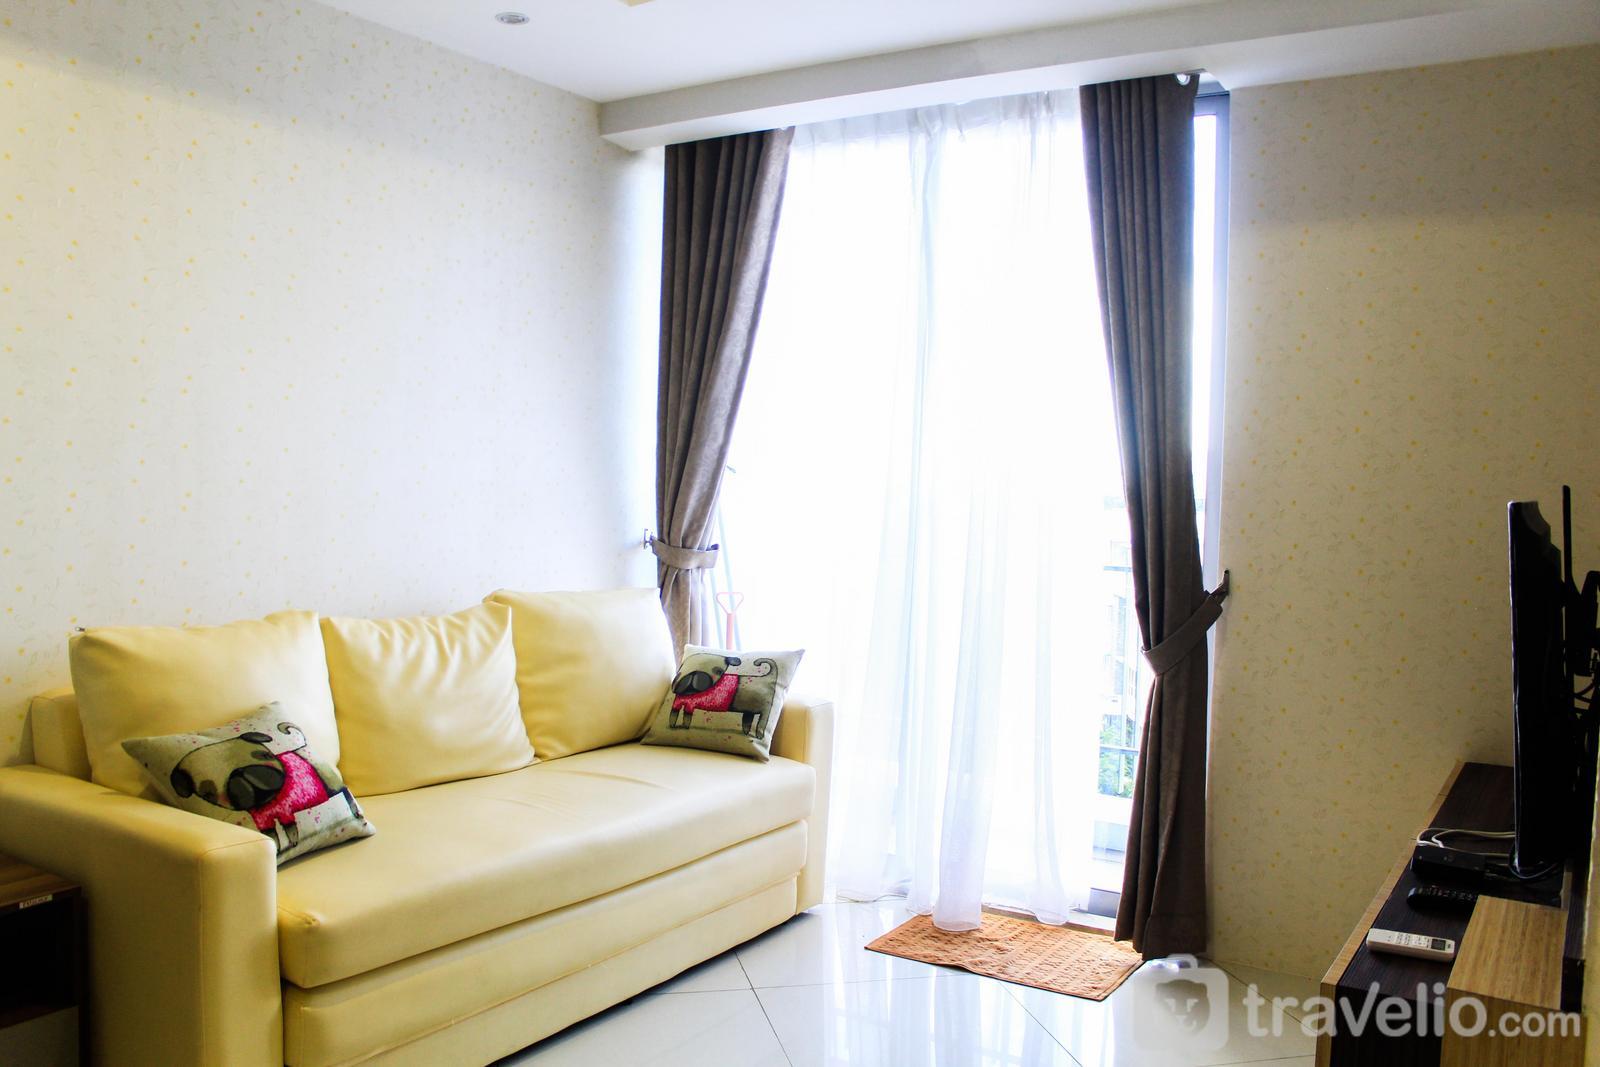 Apartemen The Mansion Kemayoran - Golf View 2BR Apartment @ The Mansion Kemayoran By Travelio